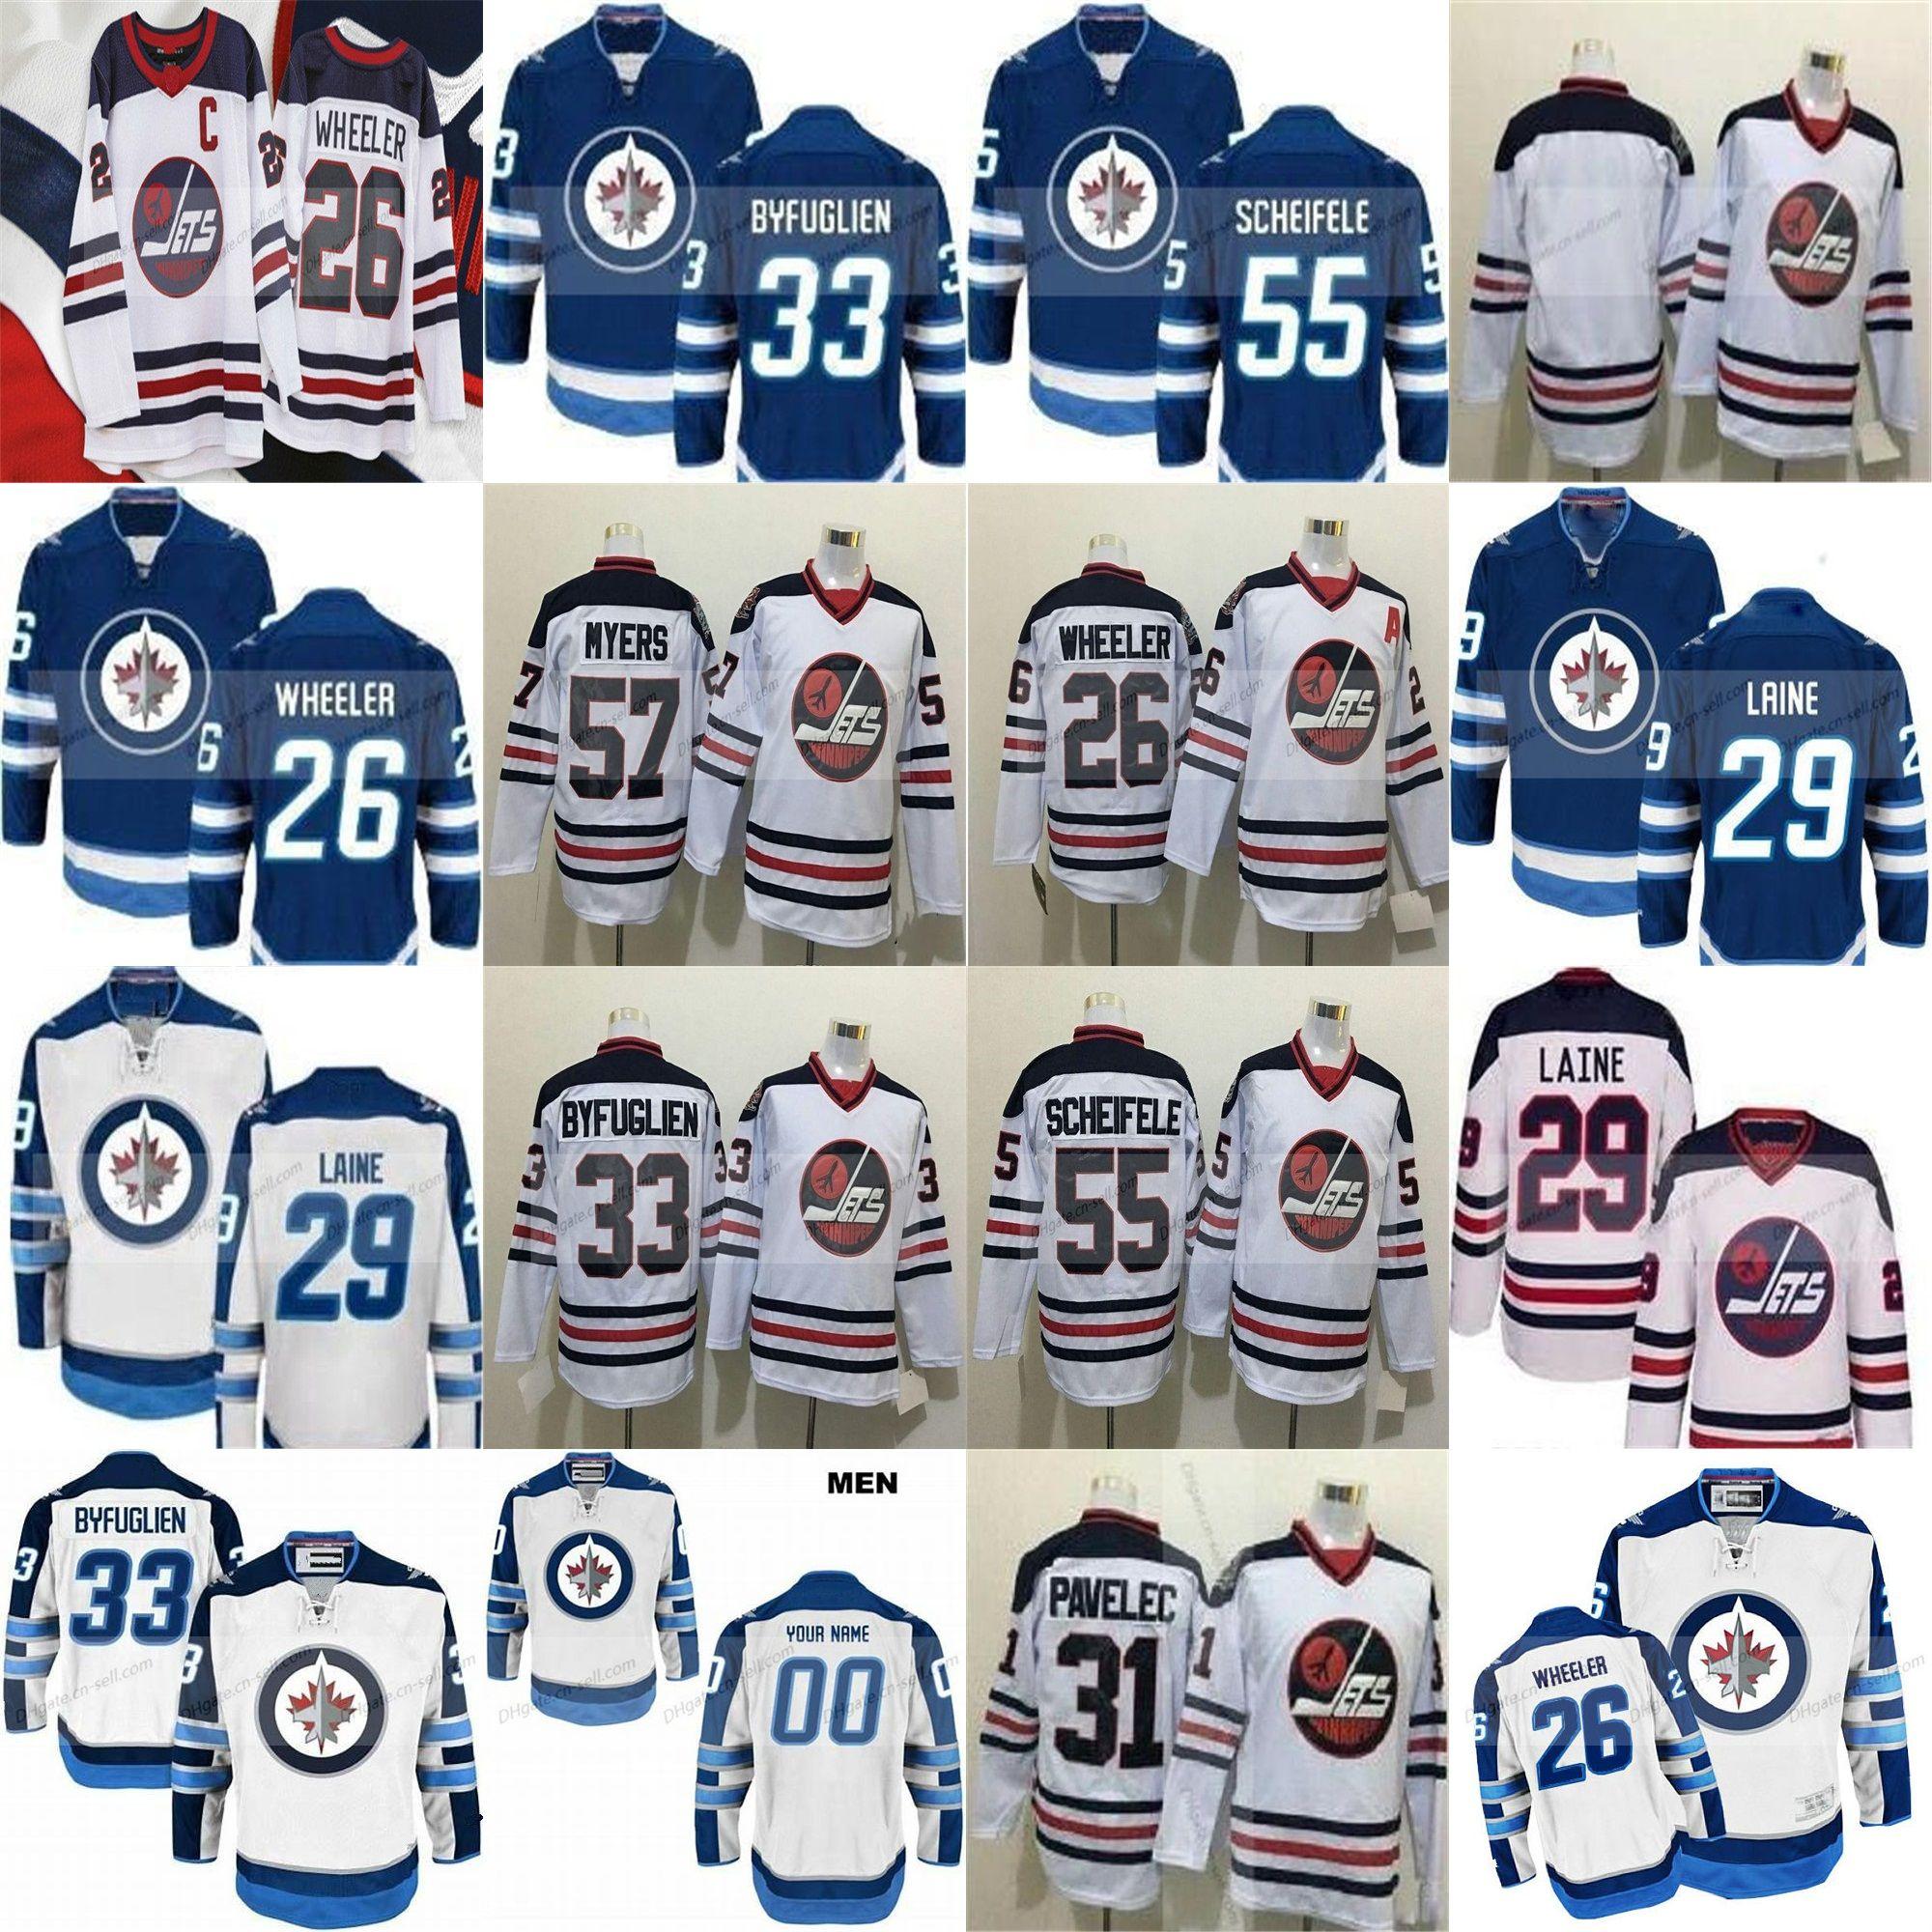 3b927551b 2019 2019 New Heritage Classic Winnipeg Jets 29 Patrik Laine Custom Men  Lady Kids Blake Wheeler Dustin Byfuglien 55 Mark Scheifele Hockey Jerseys  From Cn ...